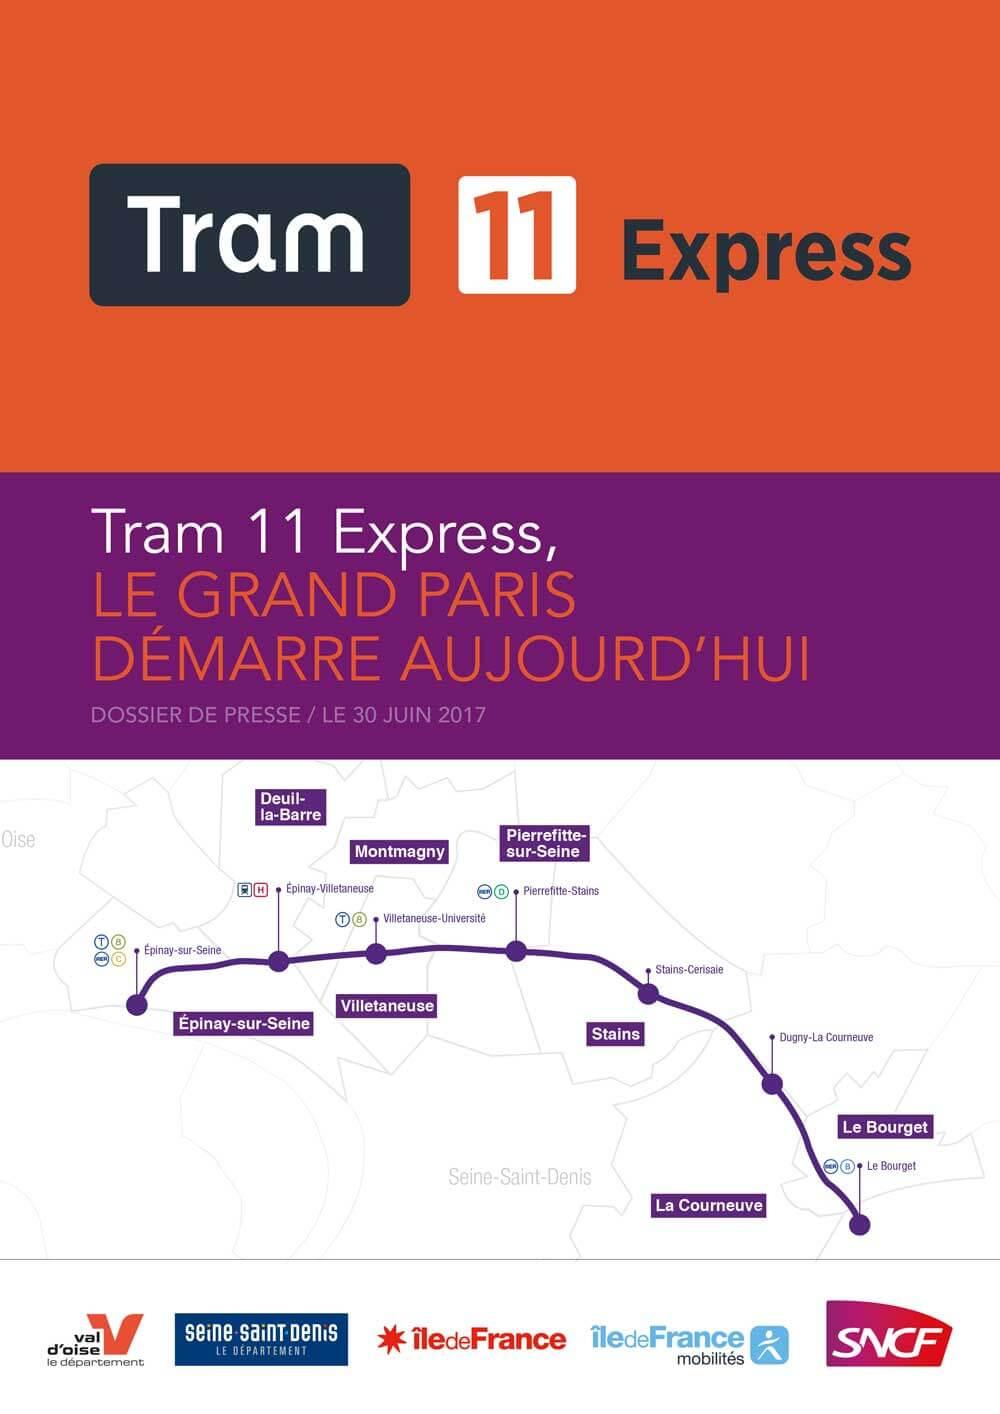 Dossier presse SNCF - Tram 1 express